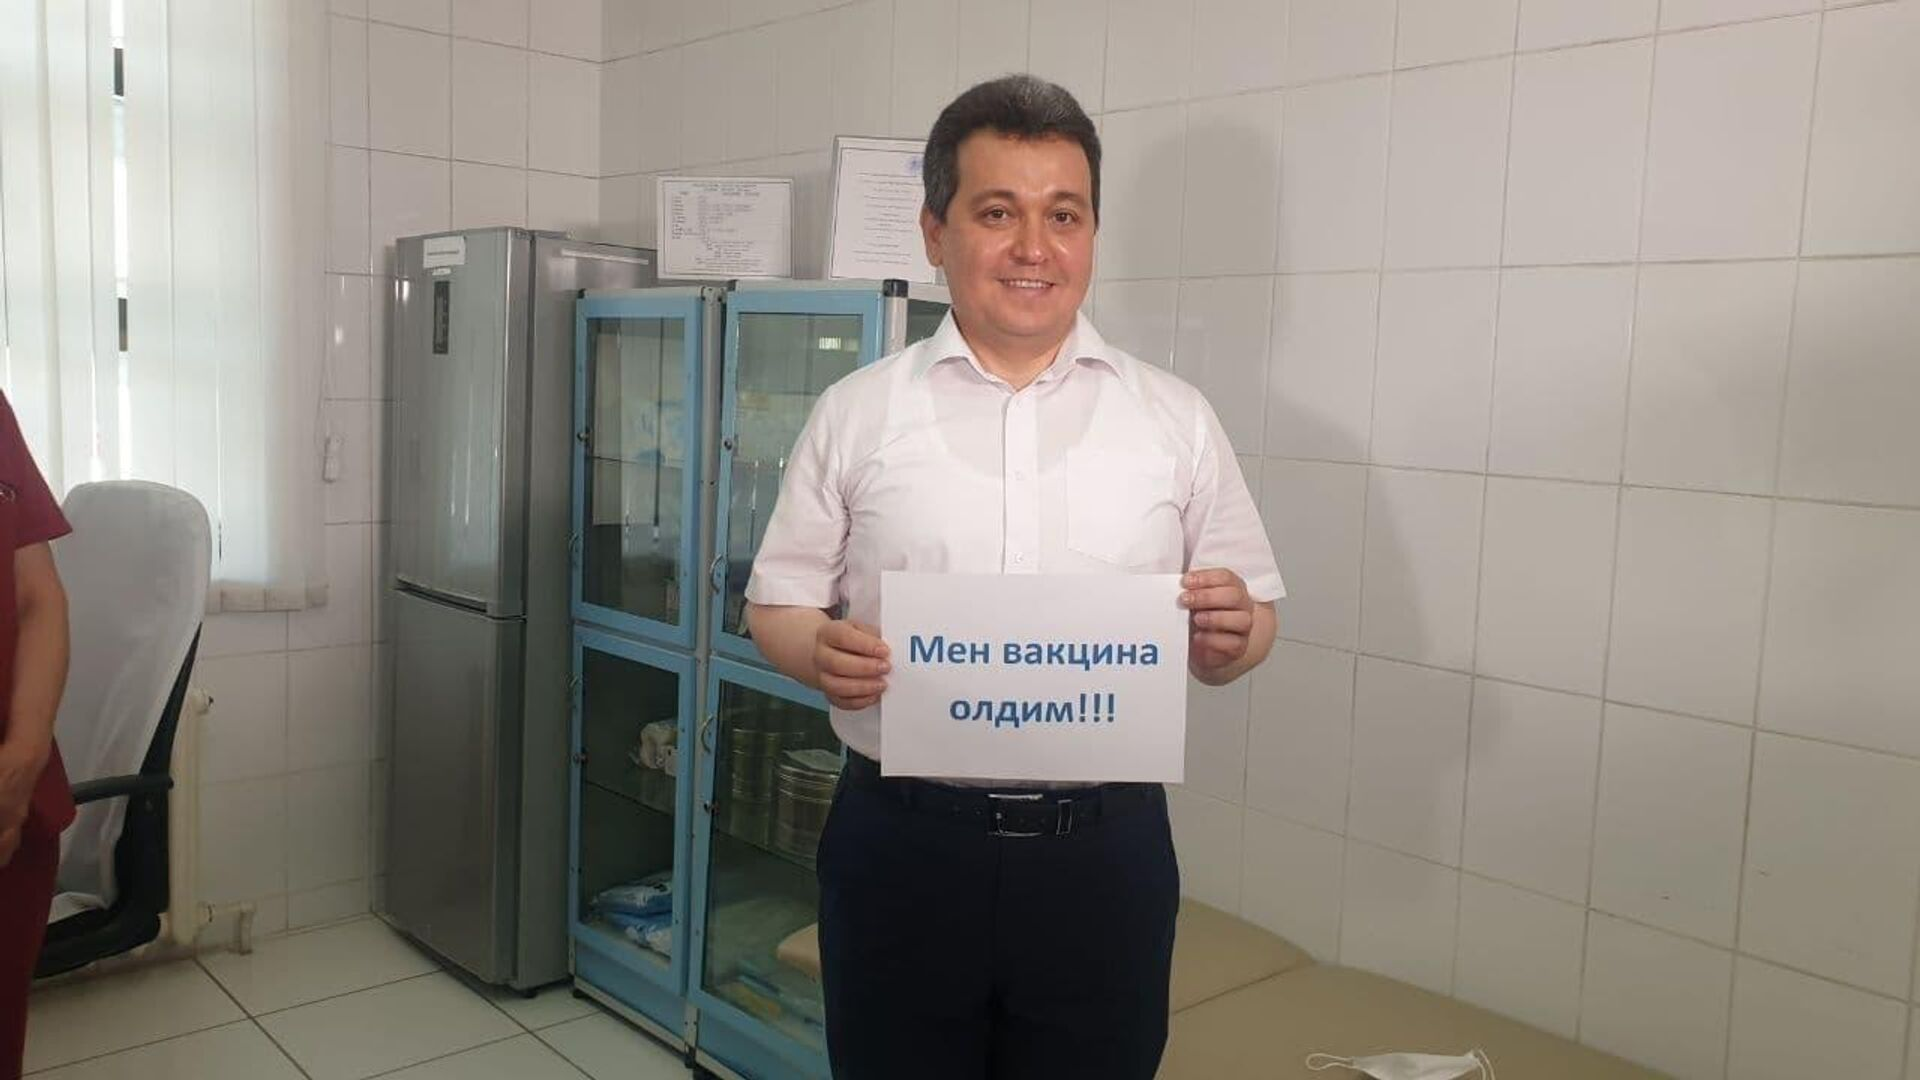 Министр народного образования Узбекистана Шерзод Шерматов вакцинировался от COVID - Sputnik Узбекистан, 1920, 02.07.2021